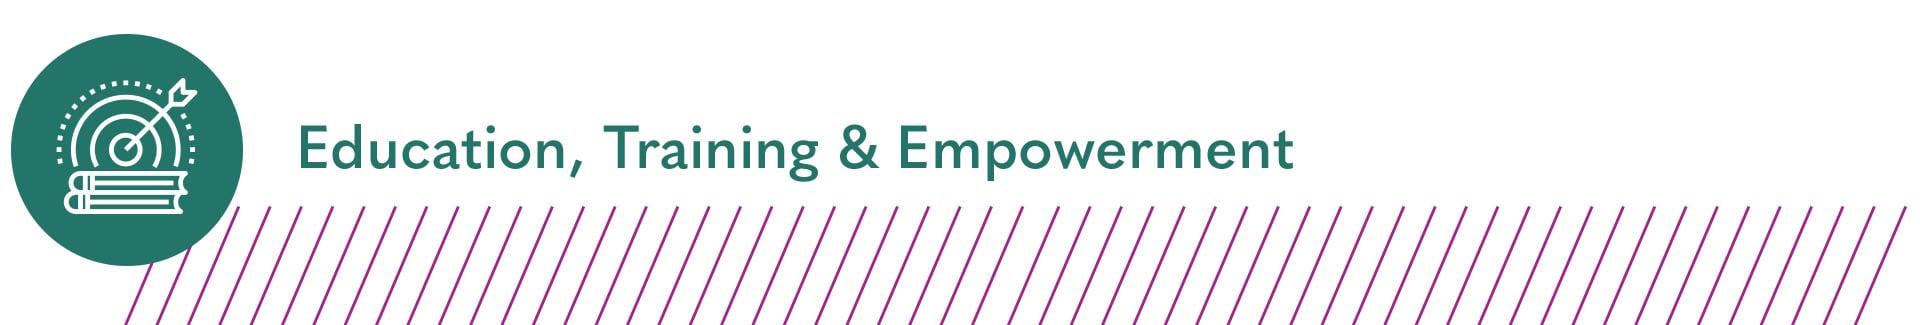 Education, Training & Empowerment